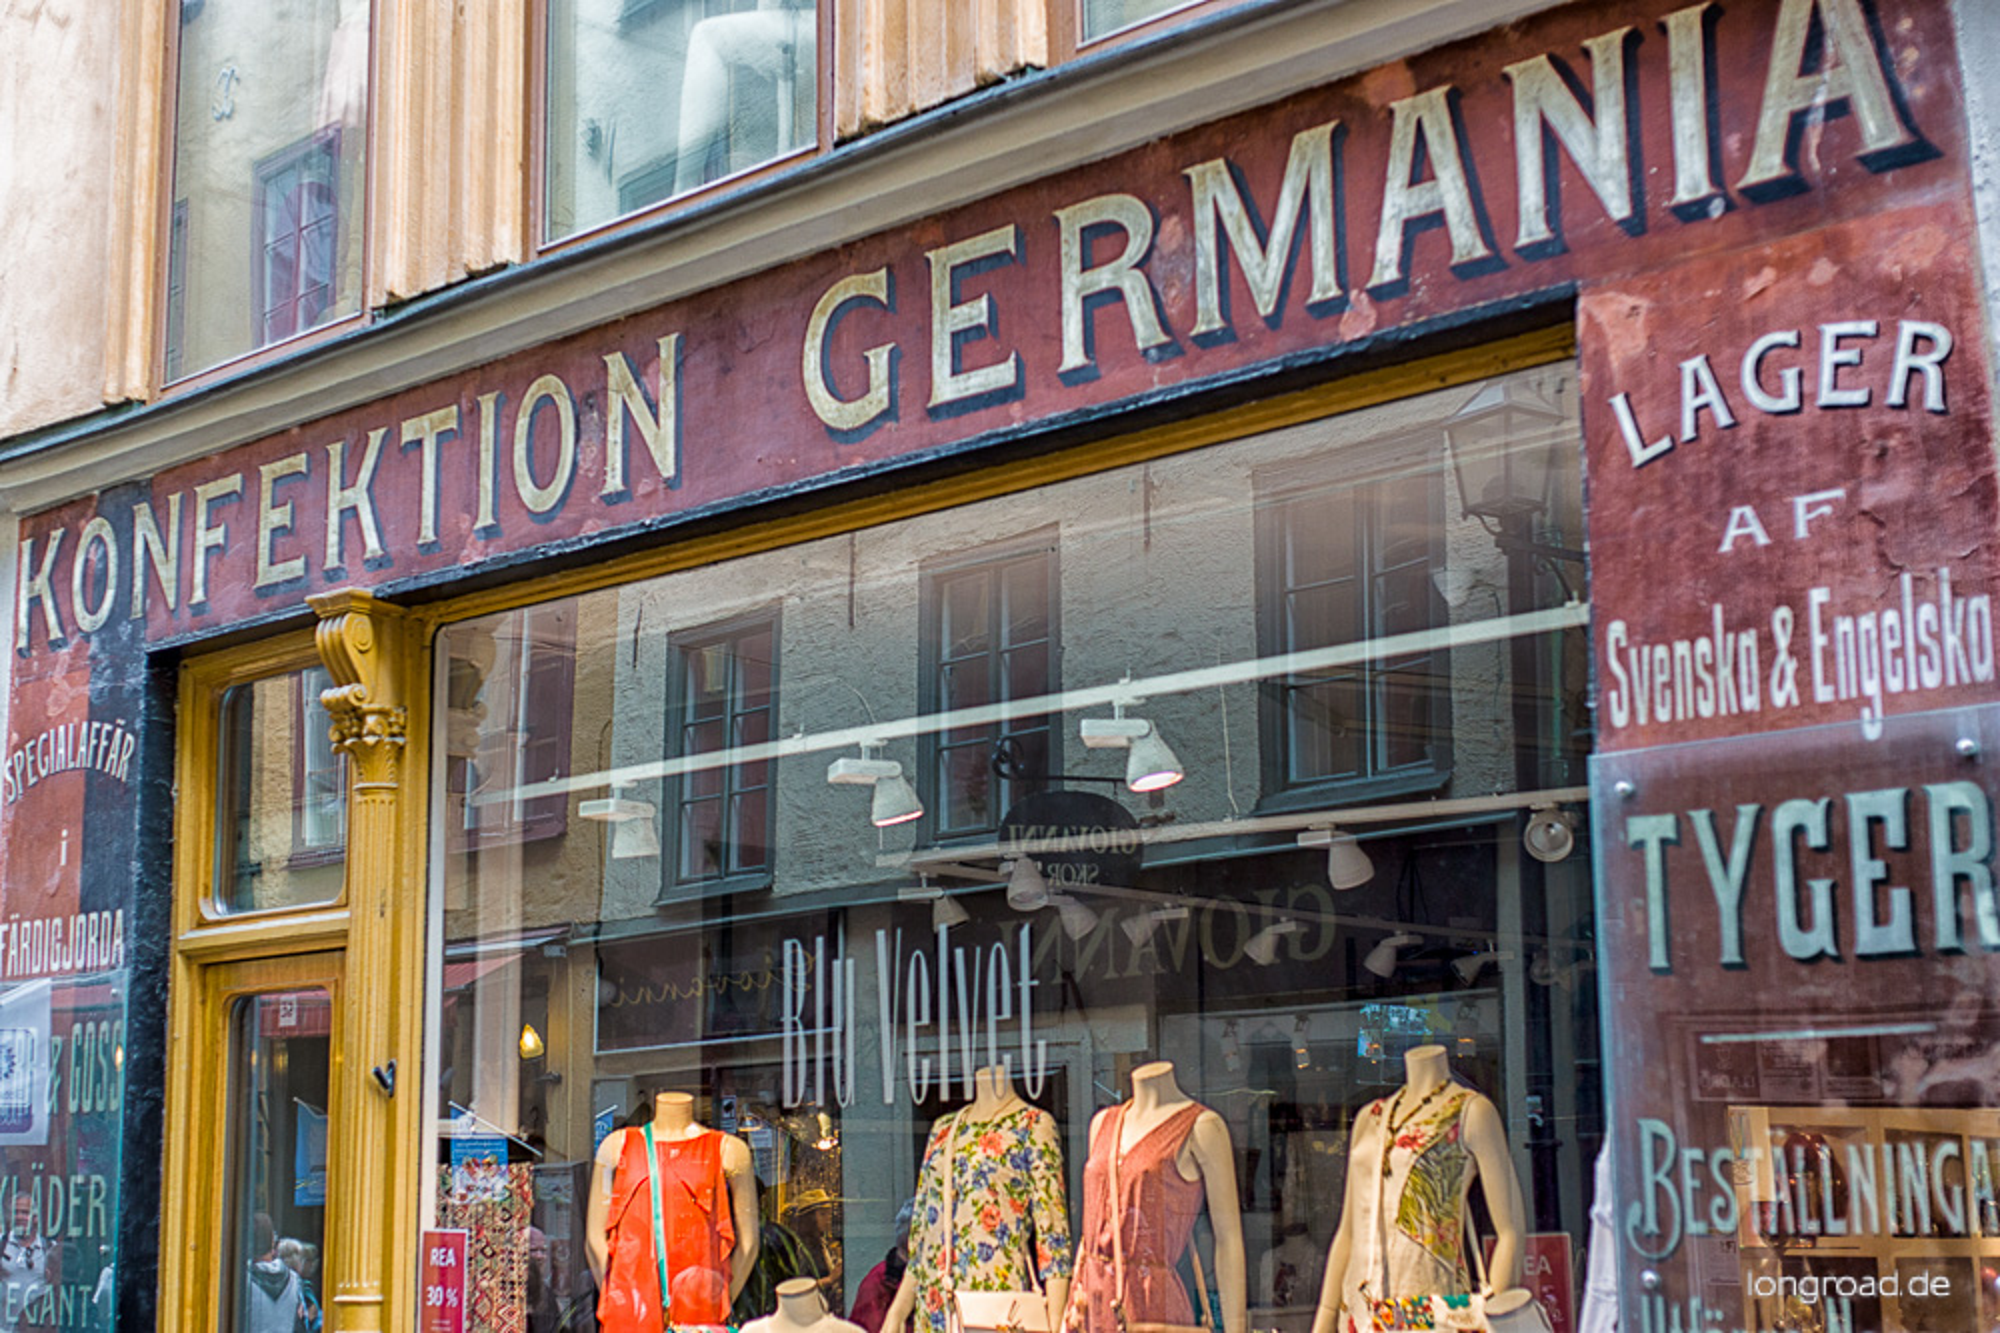 Gamla Stan - Konfektion Germania